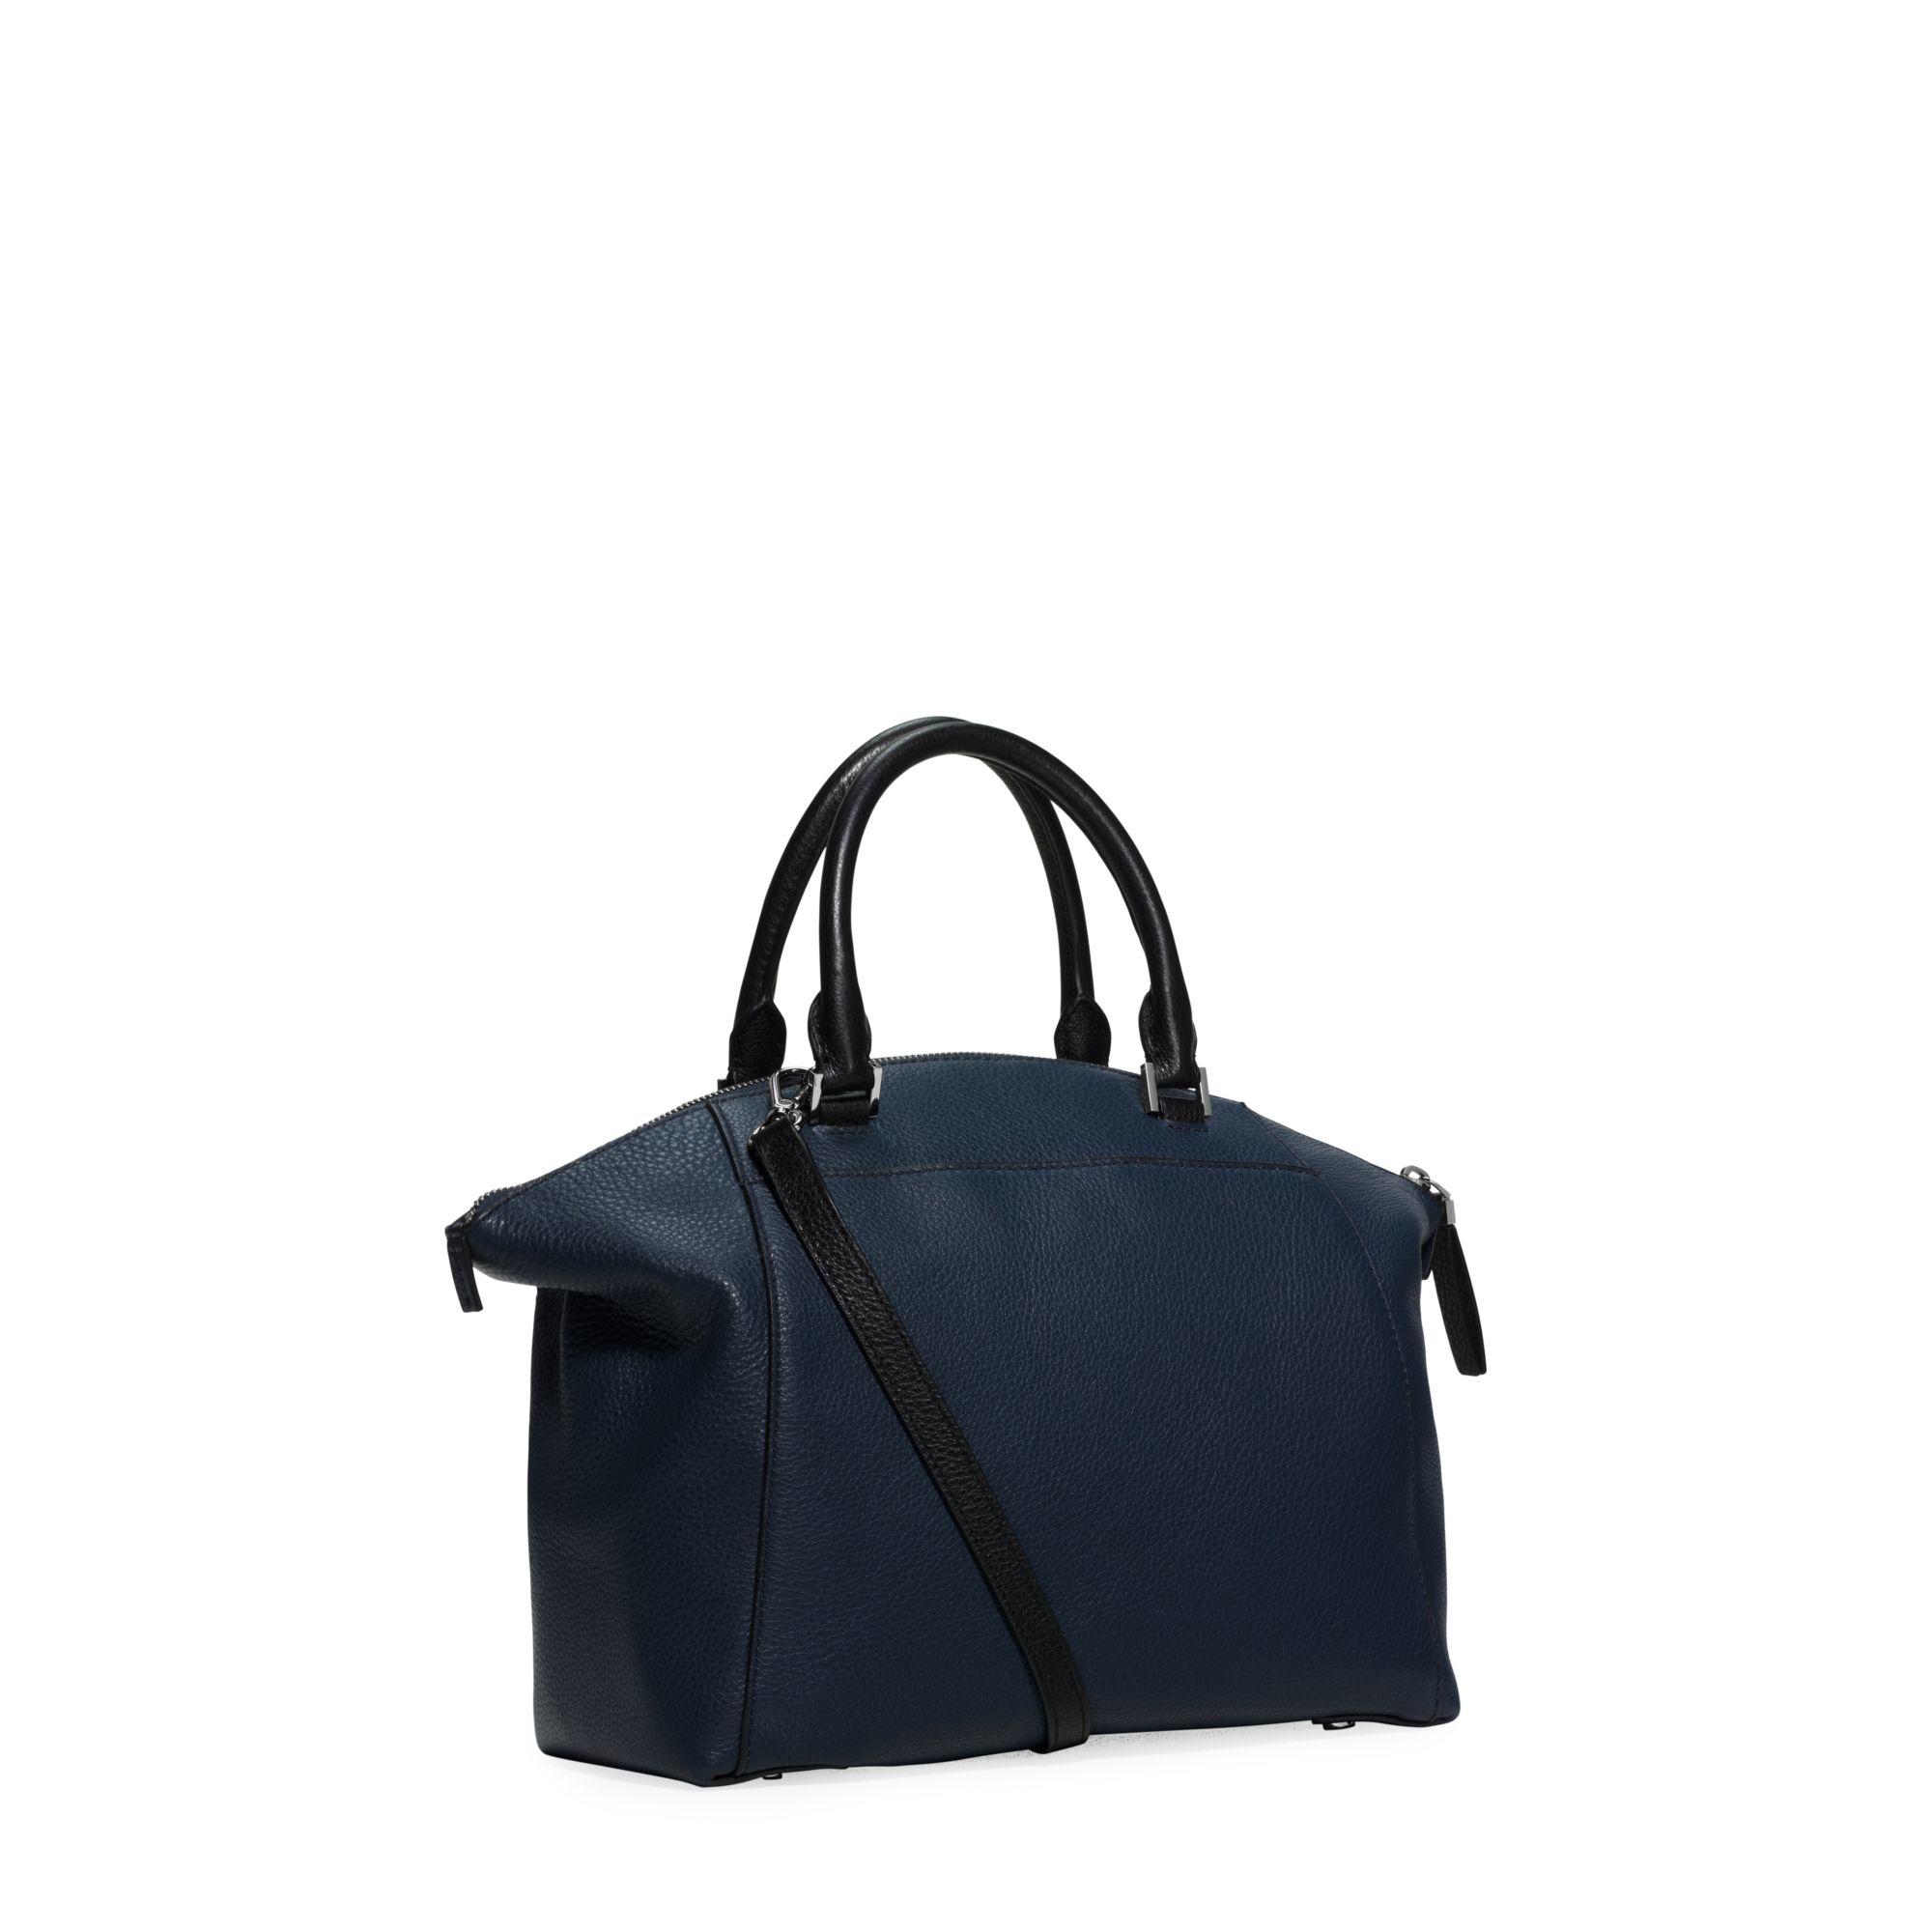 405503c71325 ... spain lyst michael kors riley medium two tone leather satchel in blue  2c9eb 57c41